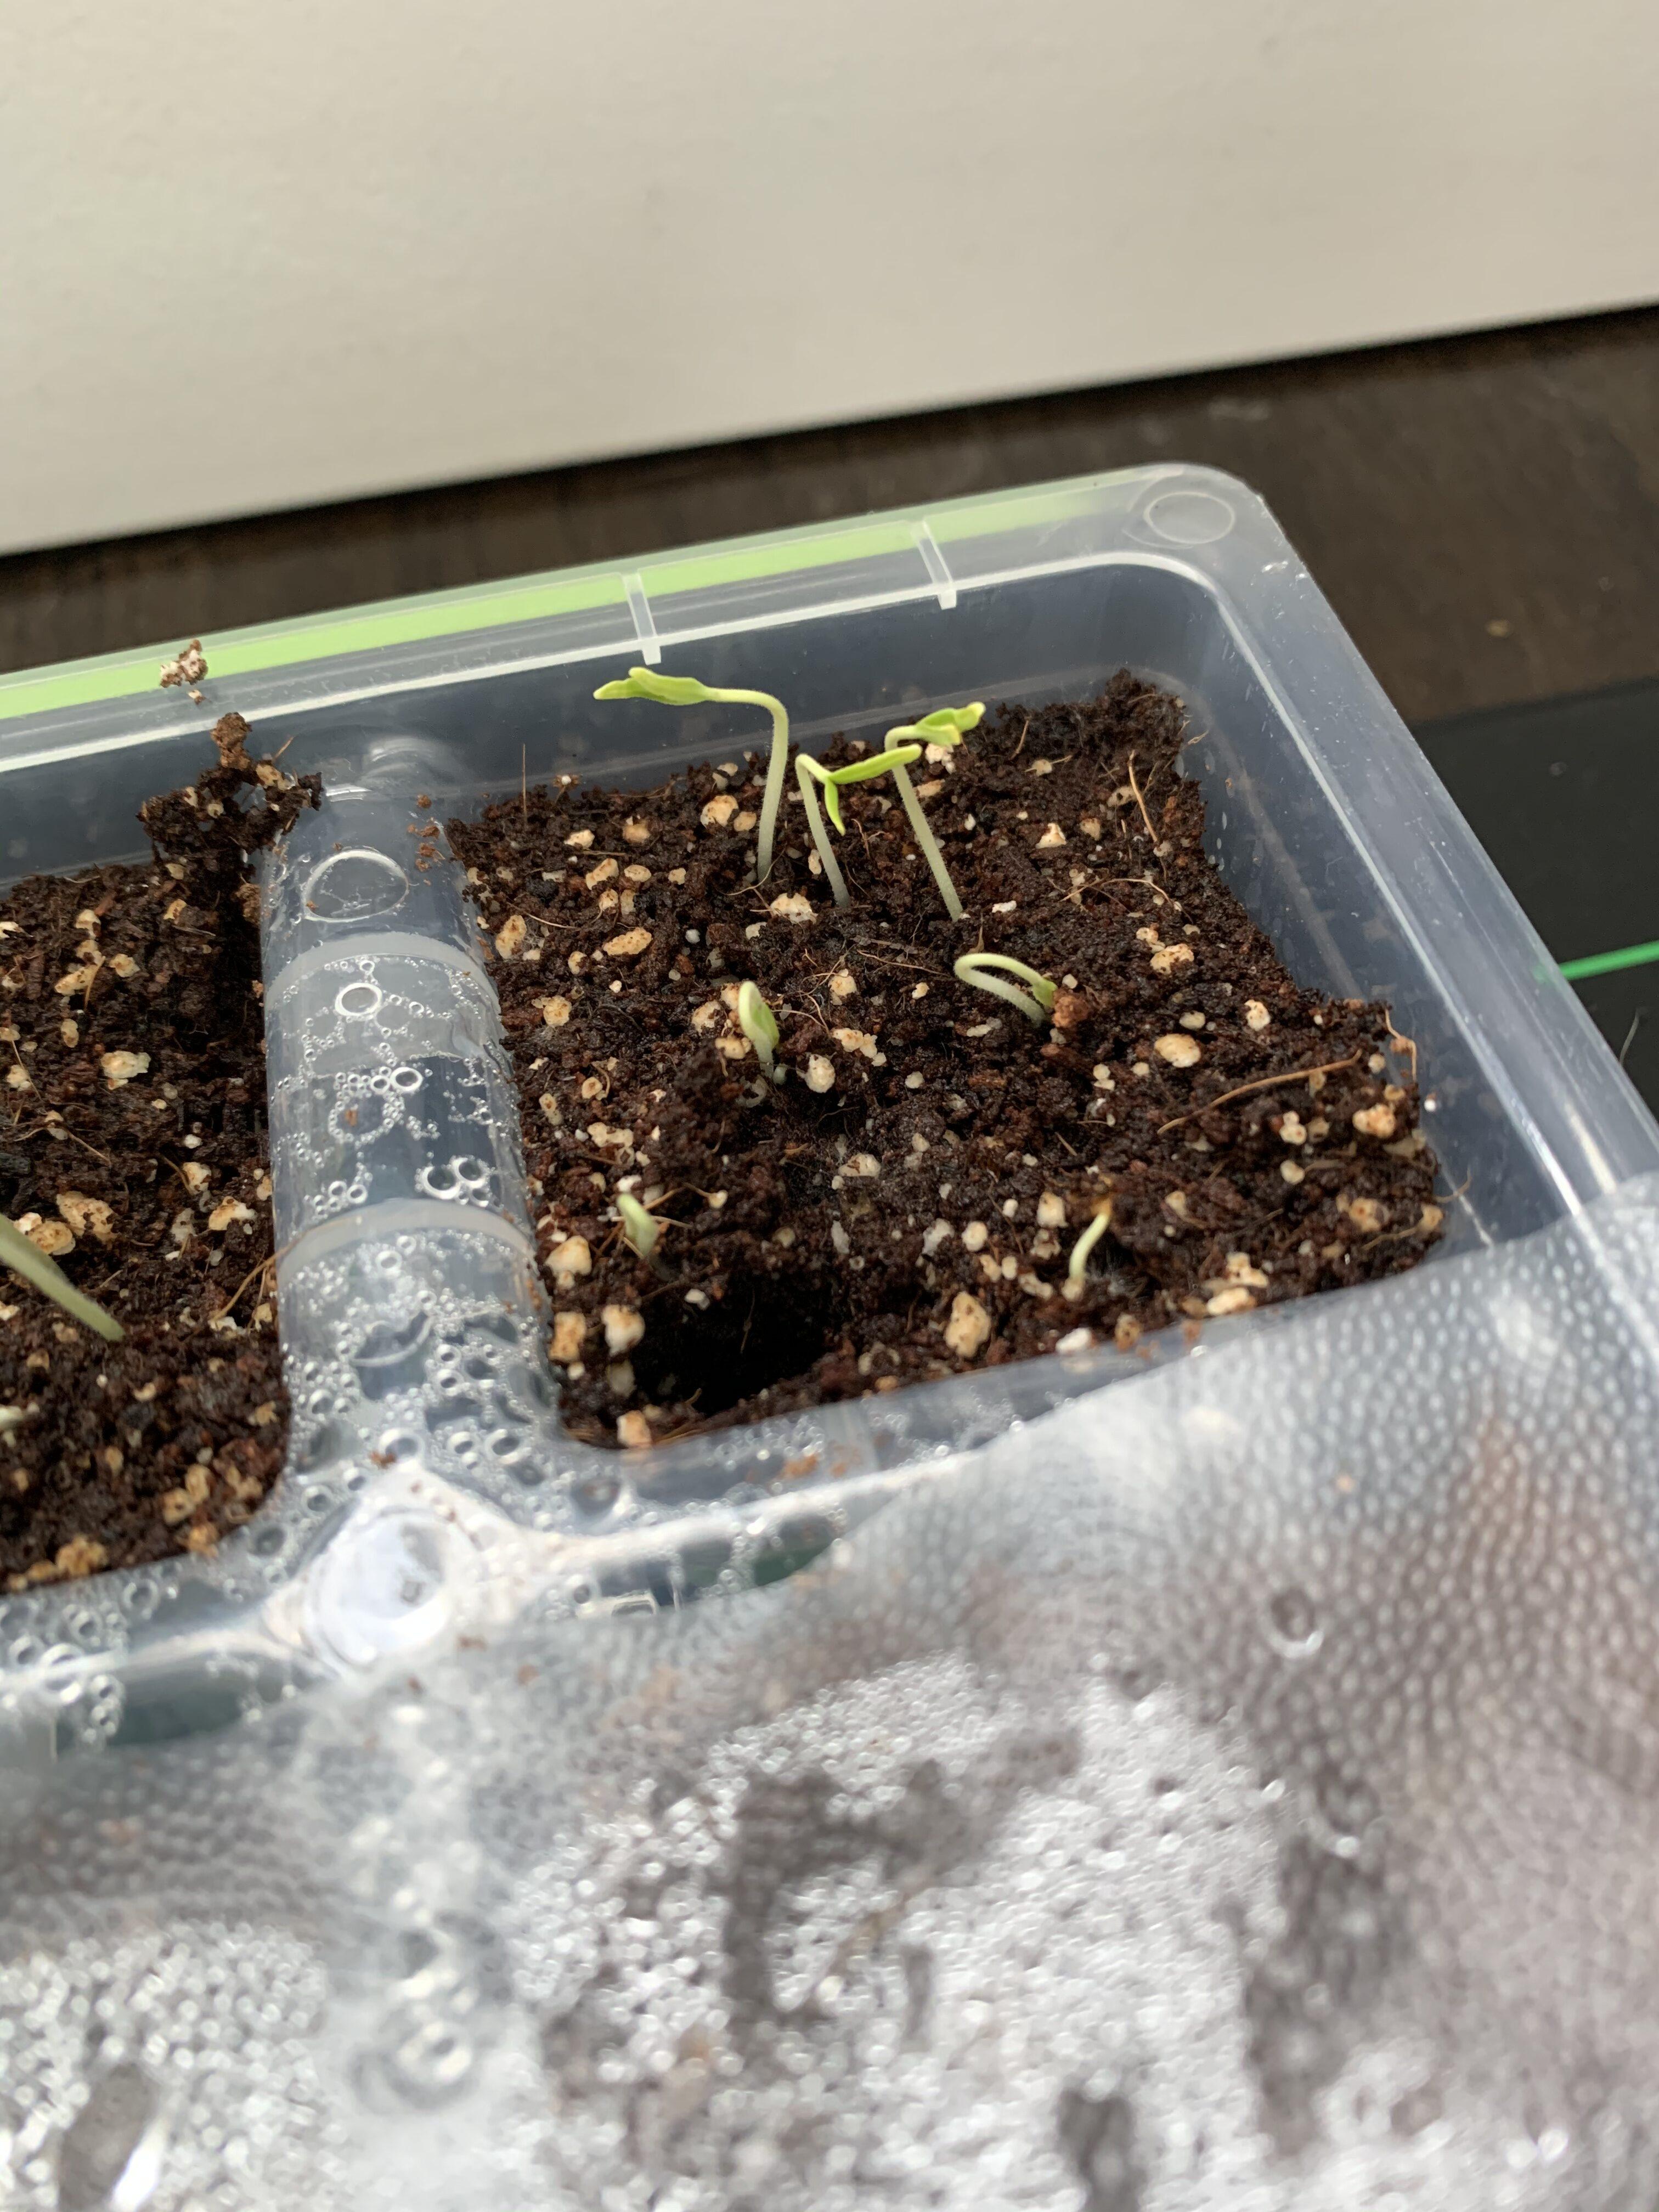 8B3B7D27 DB5E 4D84 BA46 D6556C1F6E82 How fast do tomato seedlings grow?